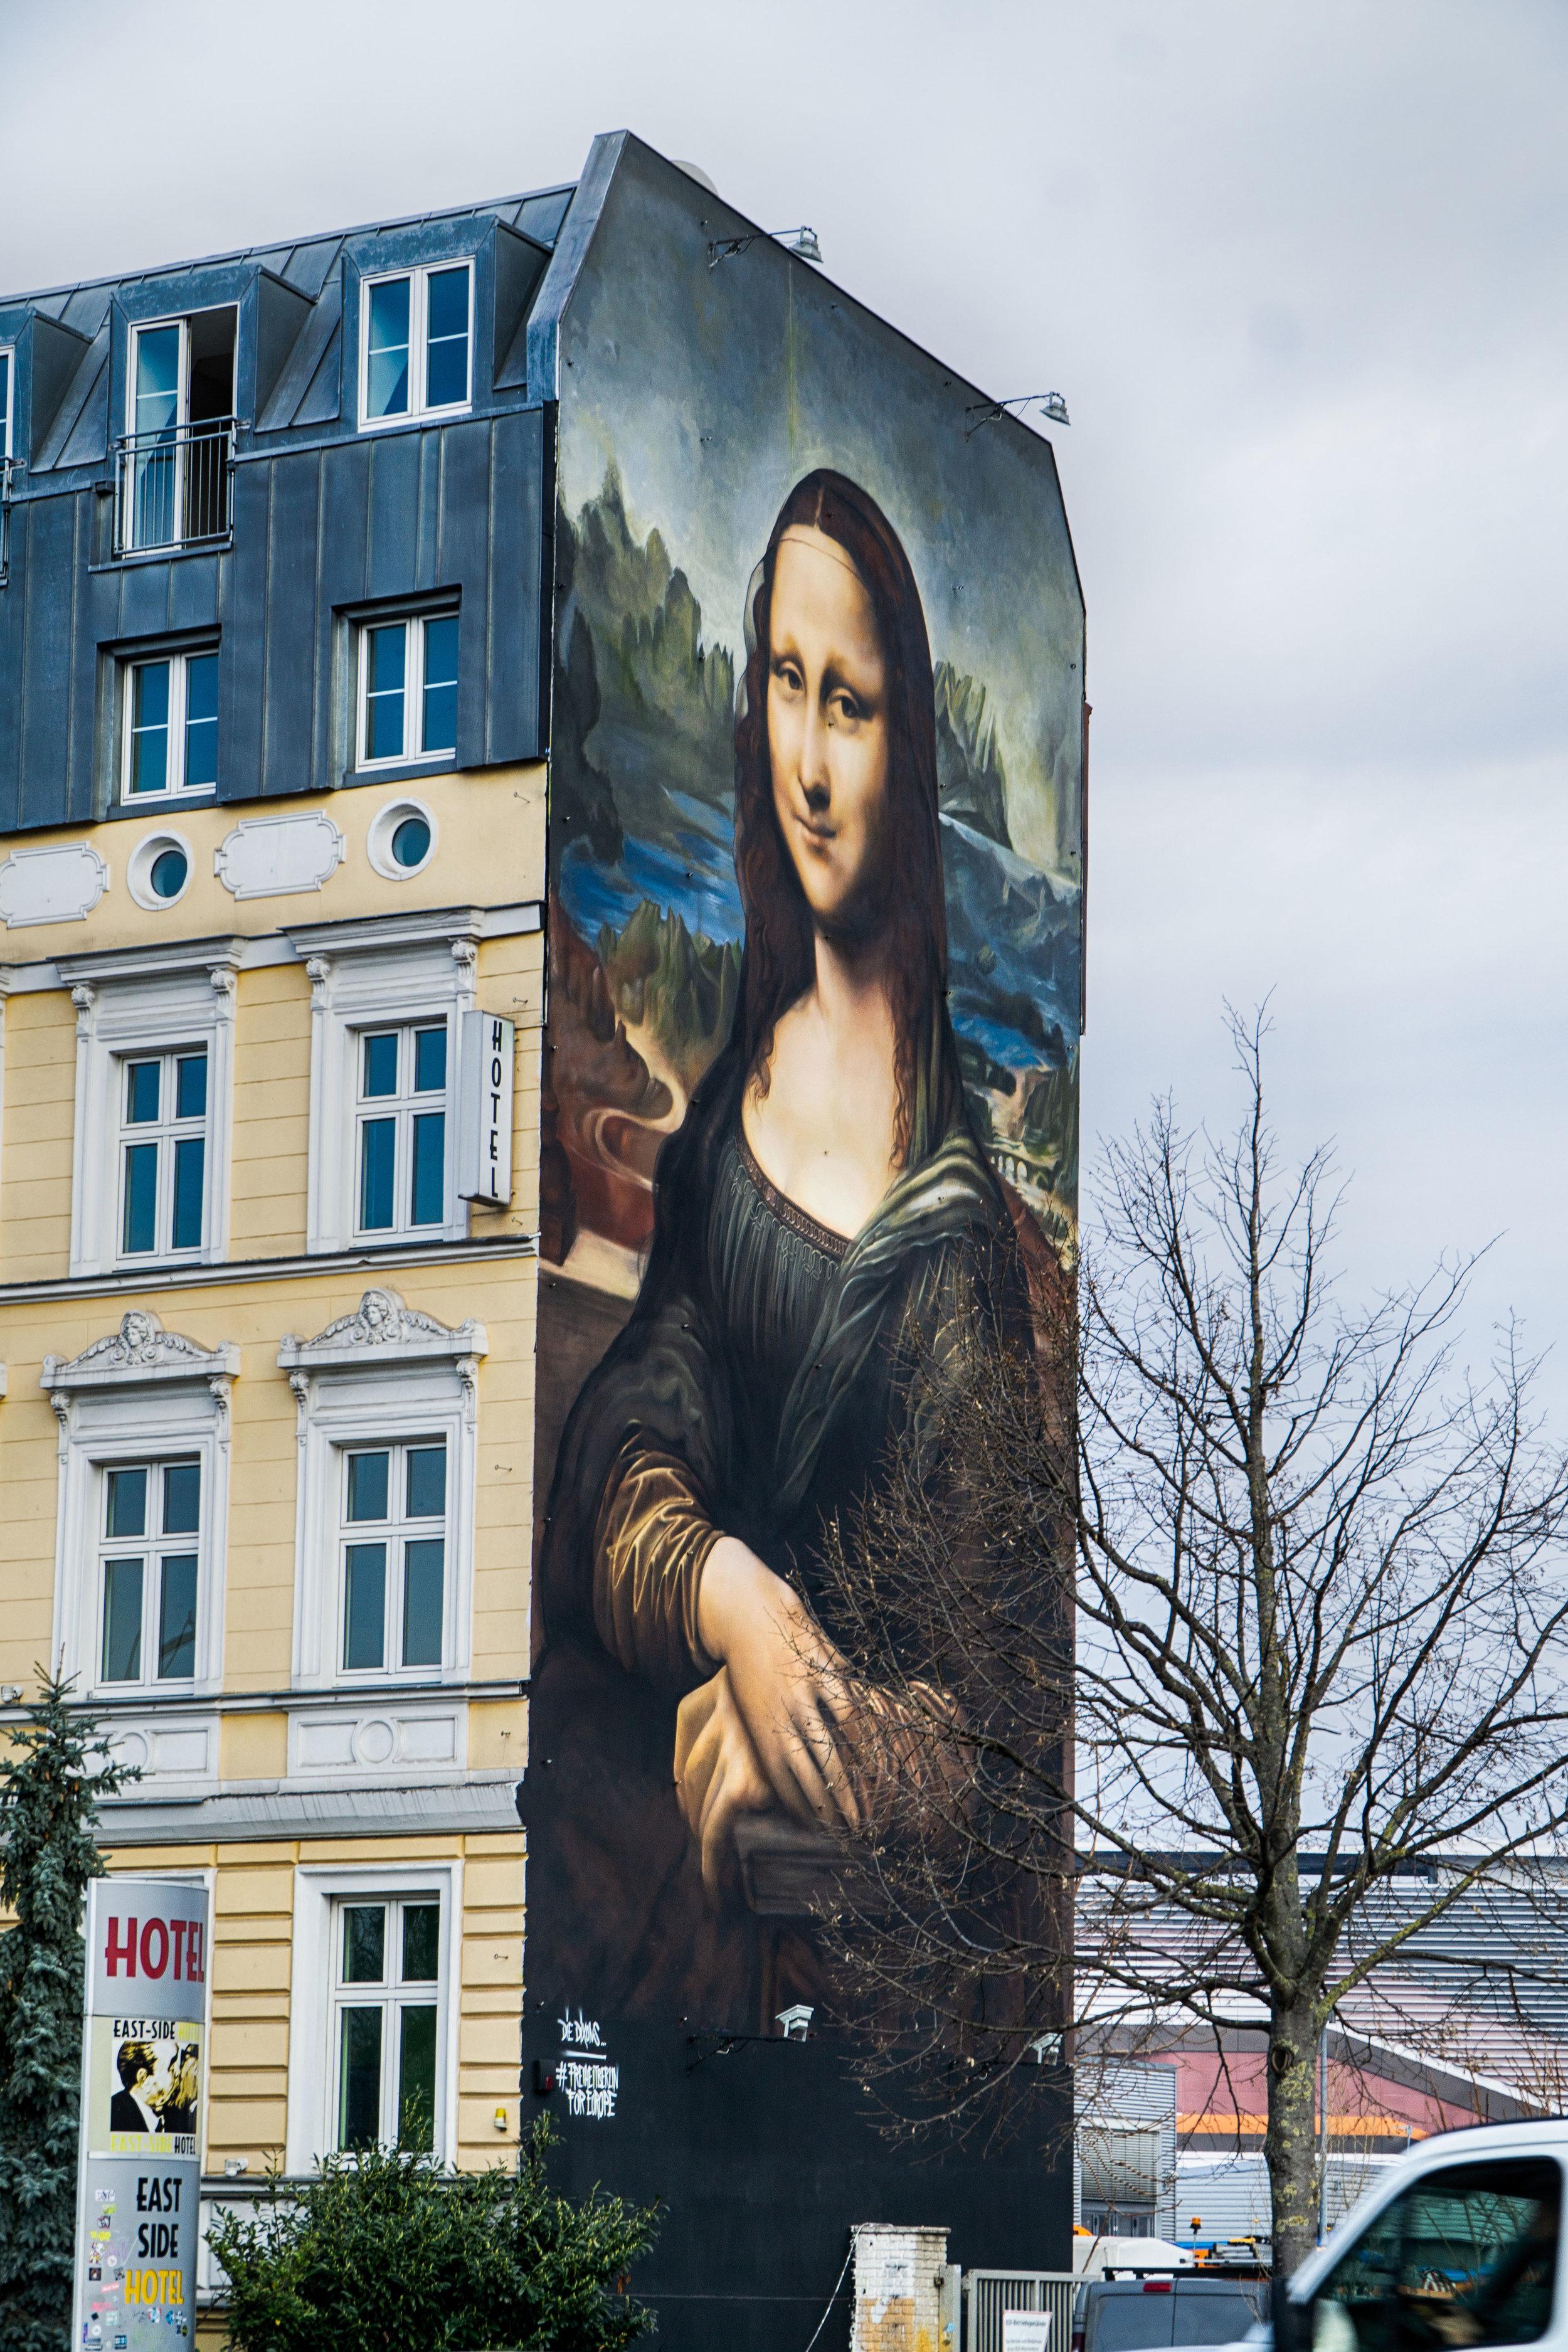 berlin_vickygood_photography.jpg